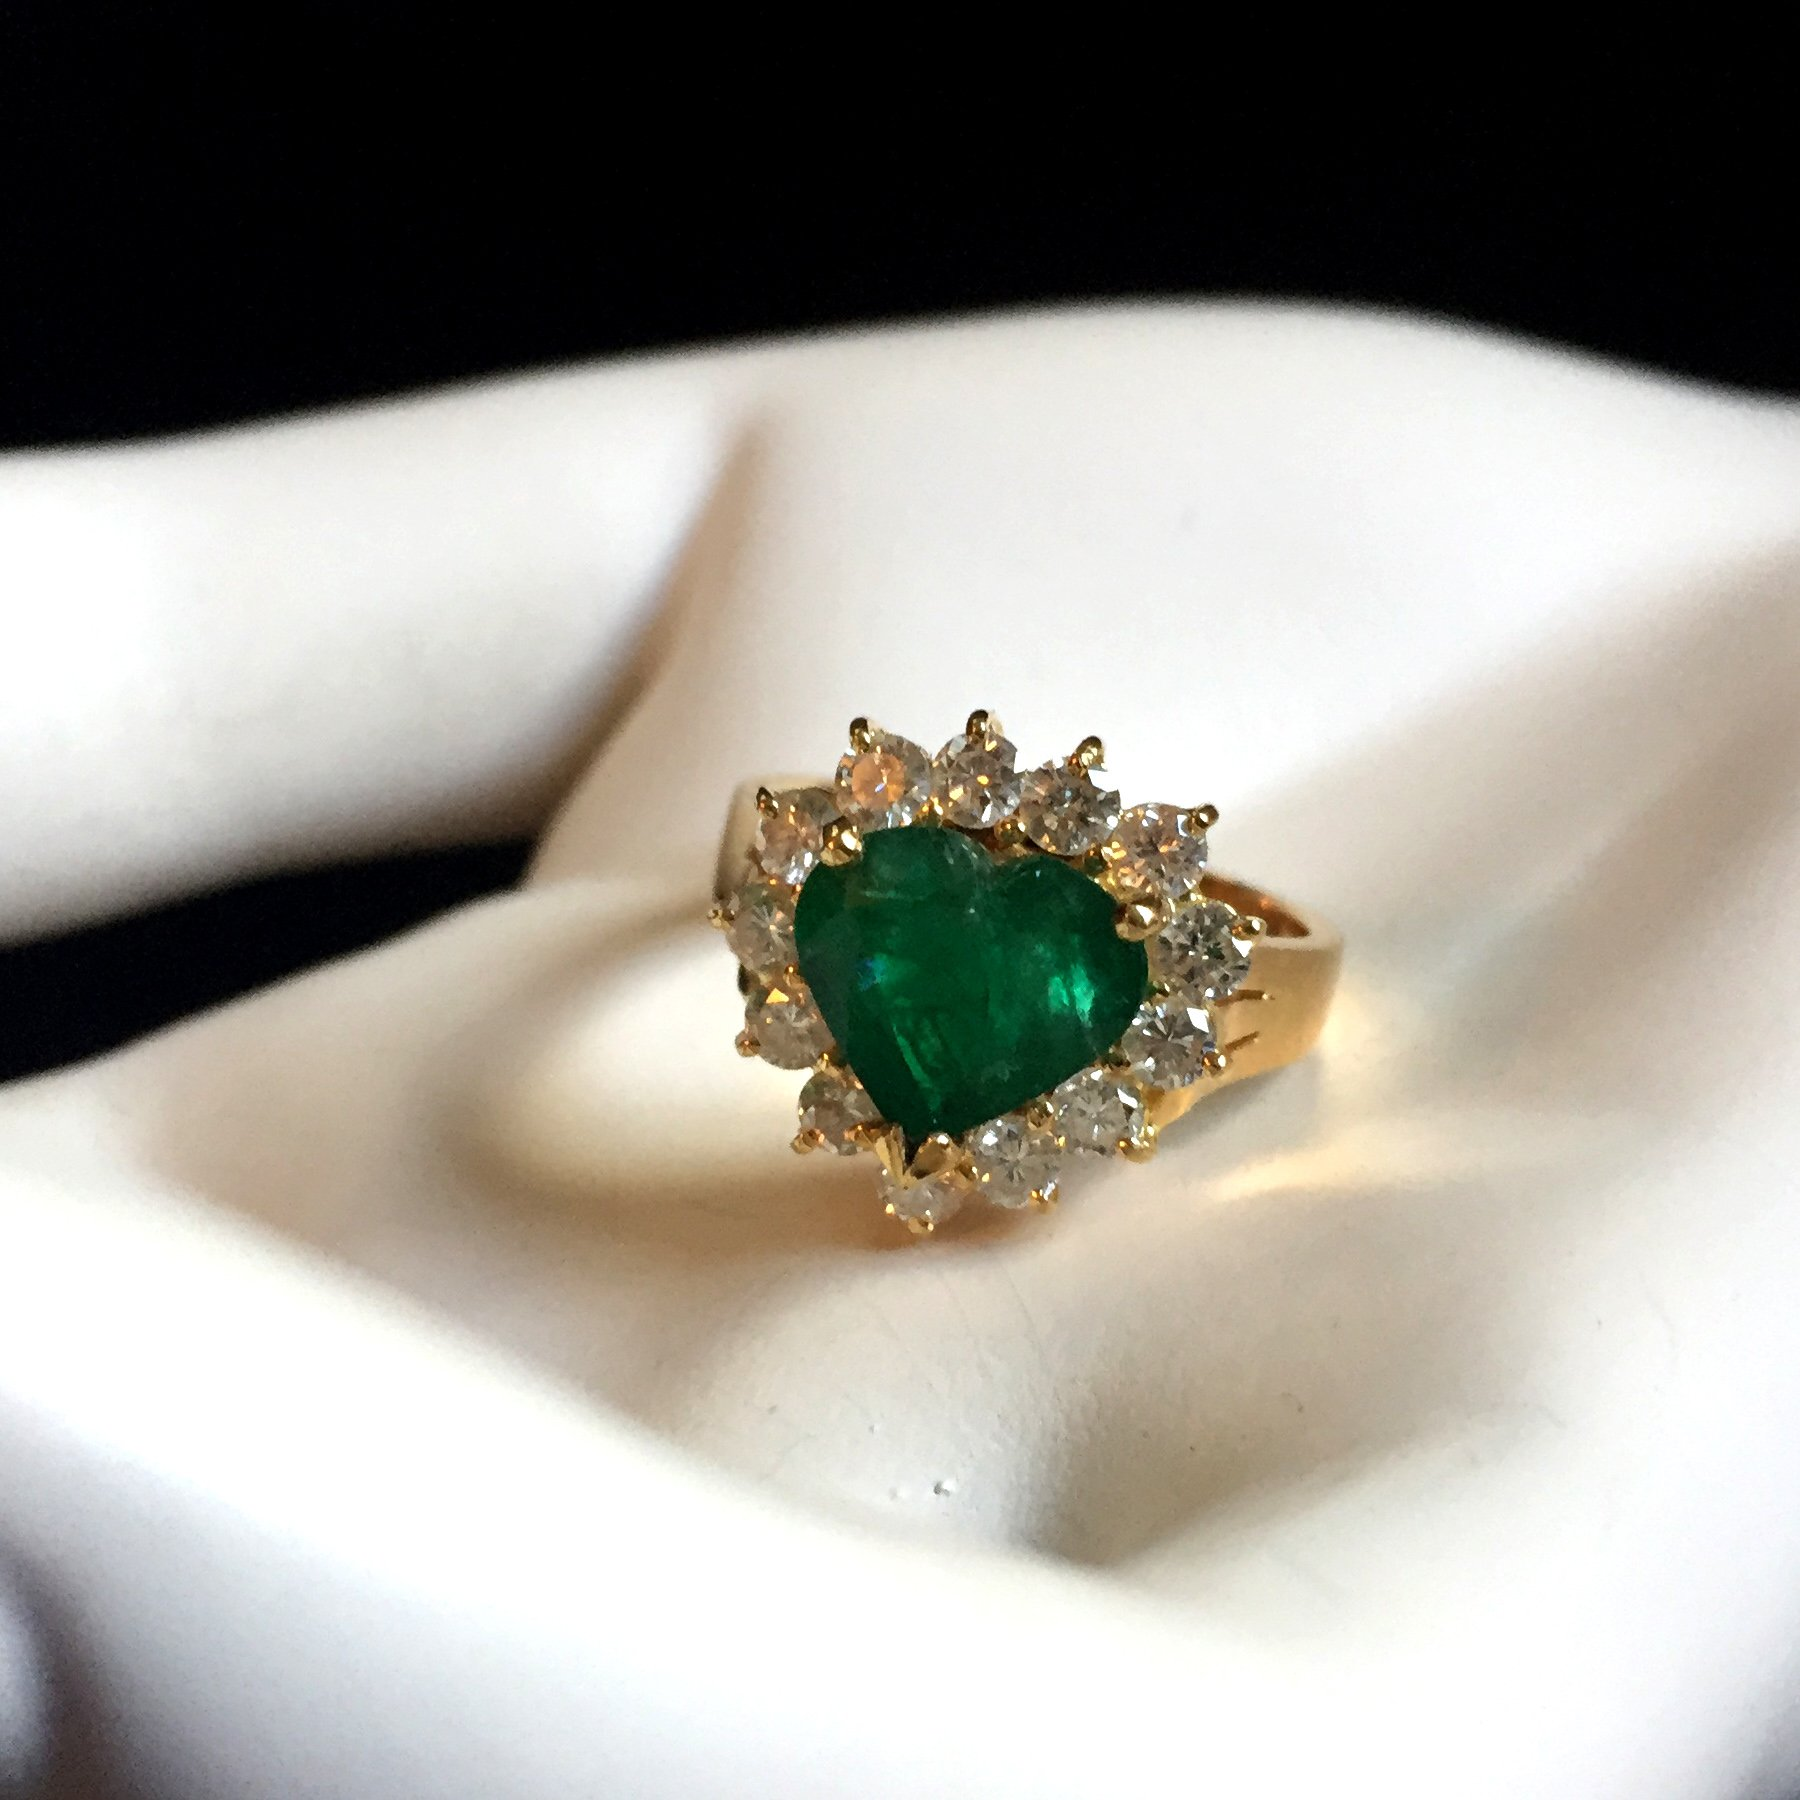 heart shape emerald diamond 18K ring @selectioncoste.com